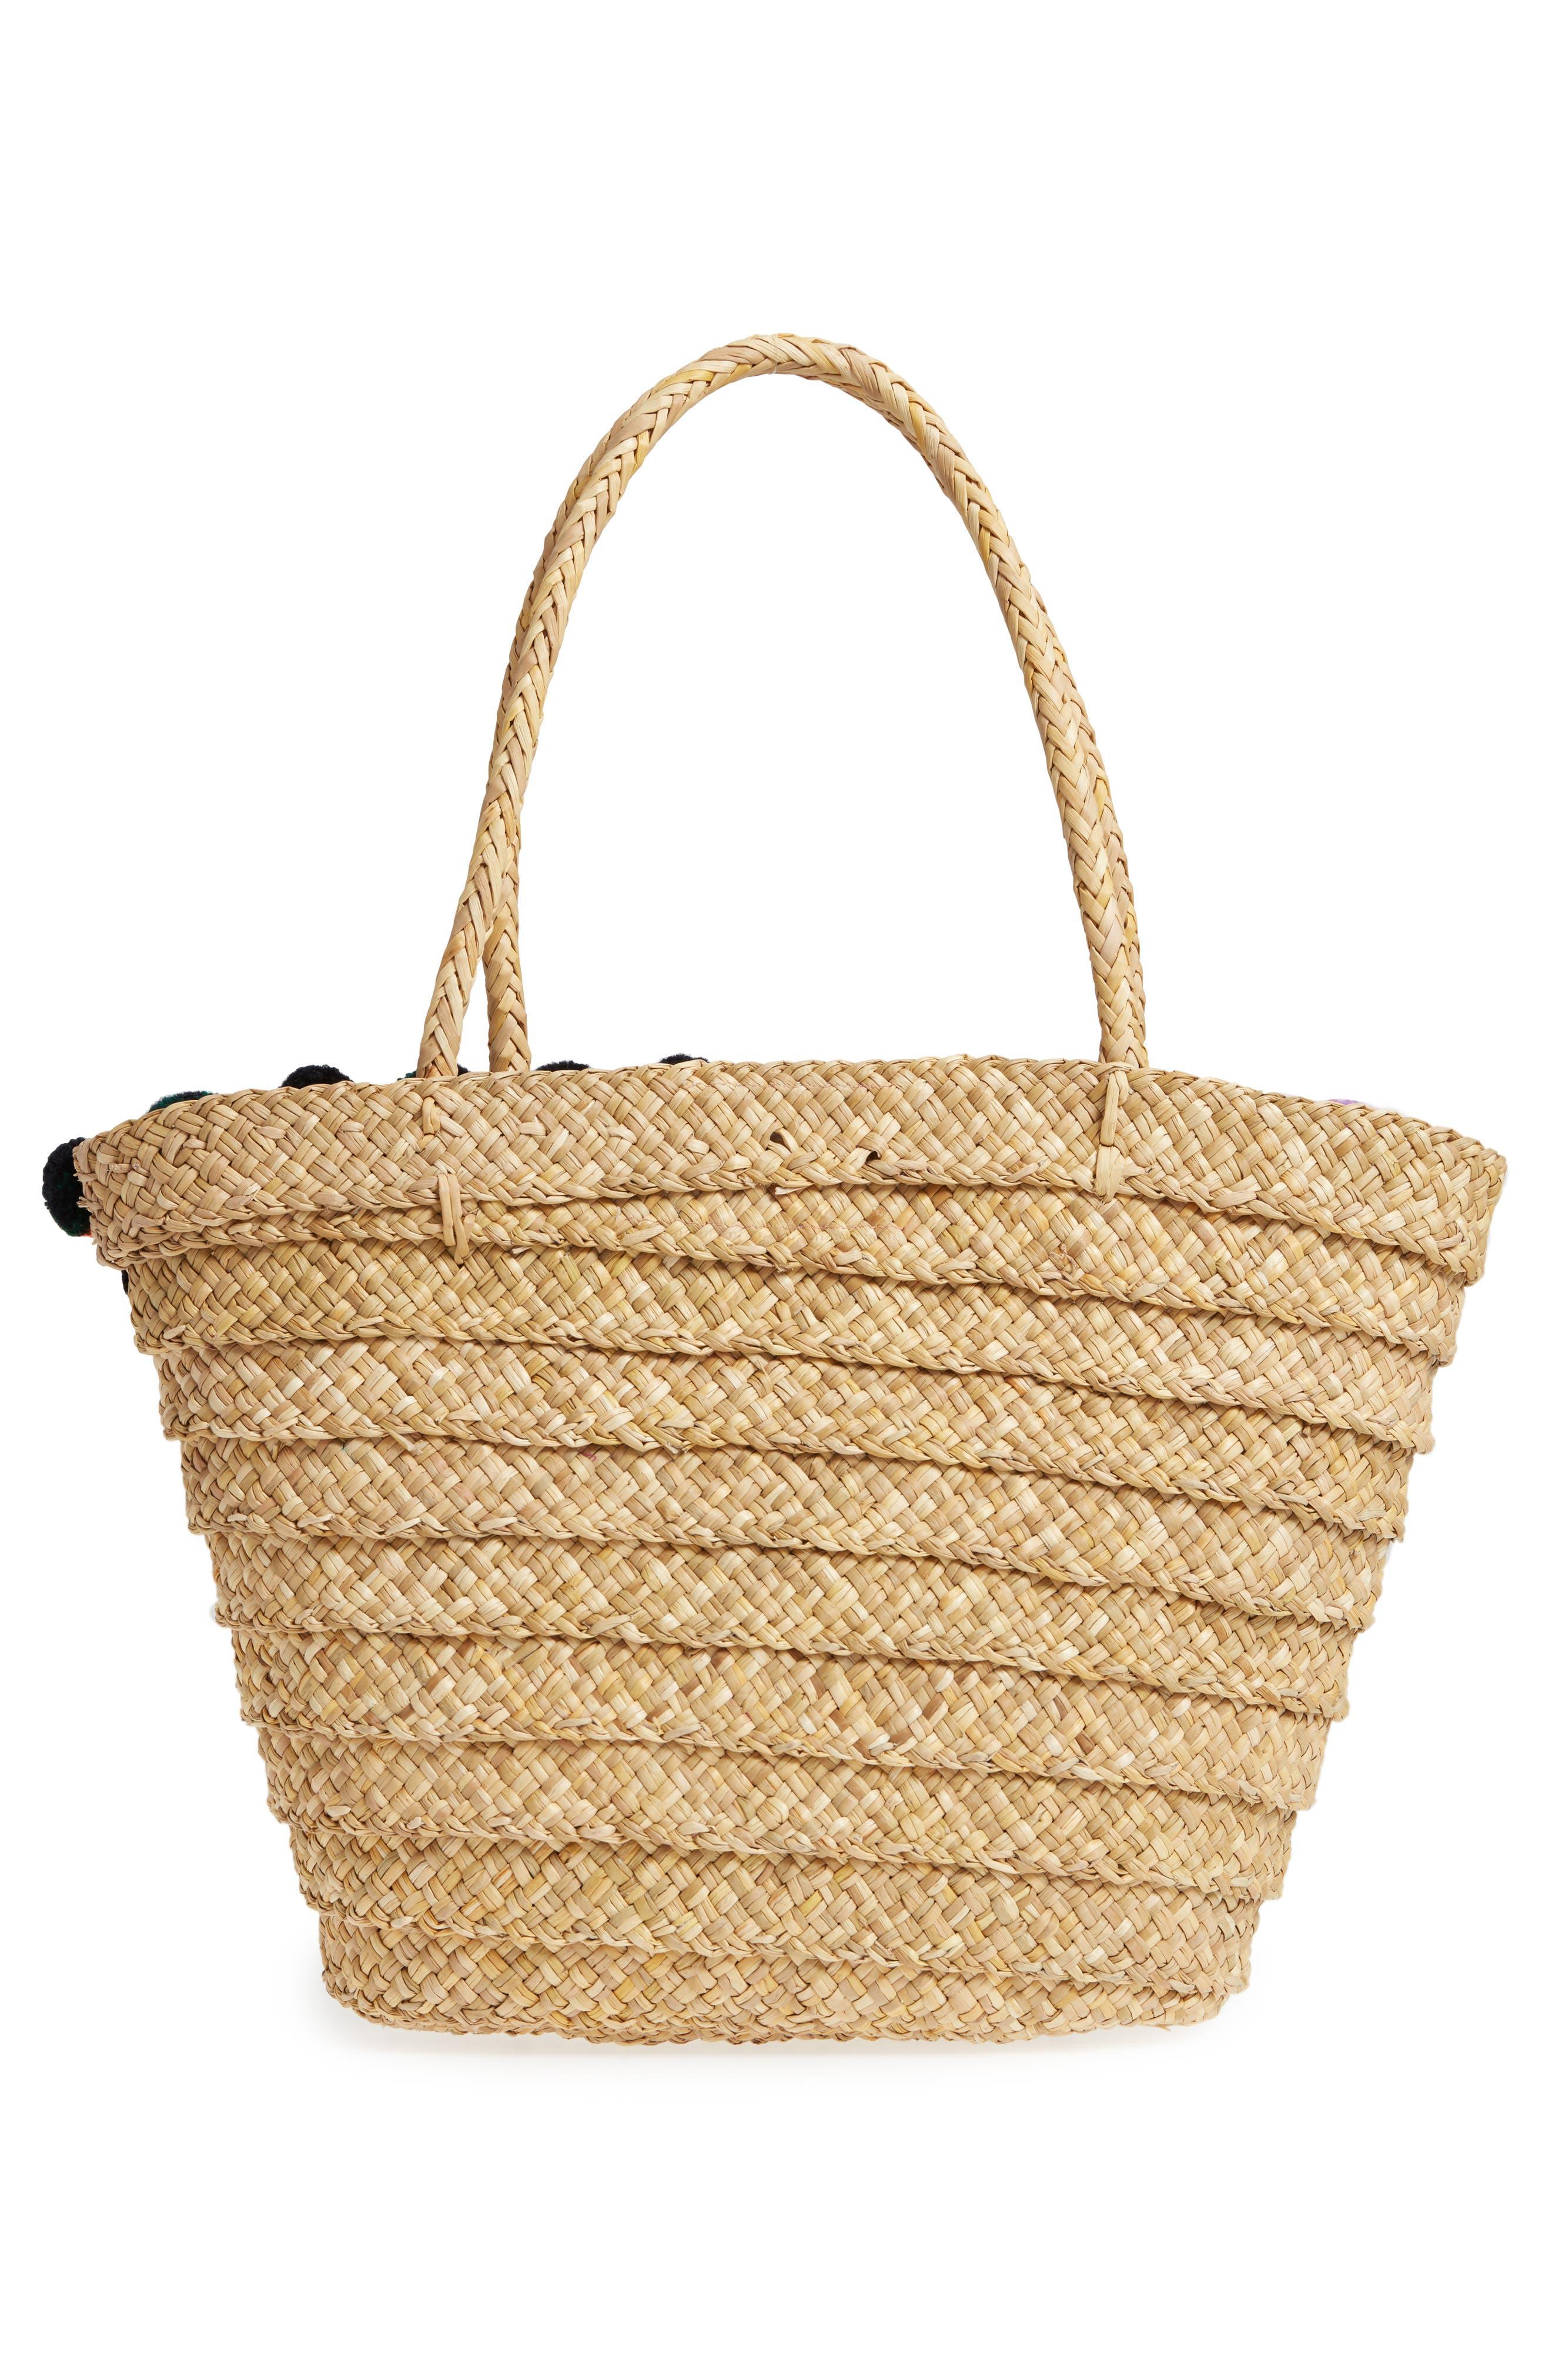 PITUSA,                             Dreamy Beach Bag,                             Alternate thumbnail 3, color,                             250